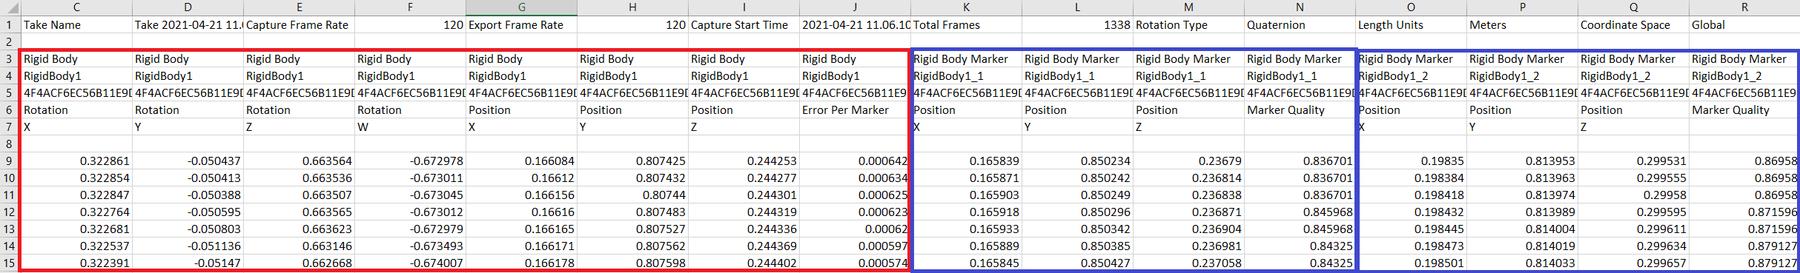 csv_data.png